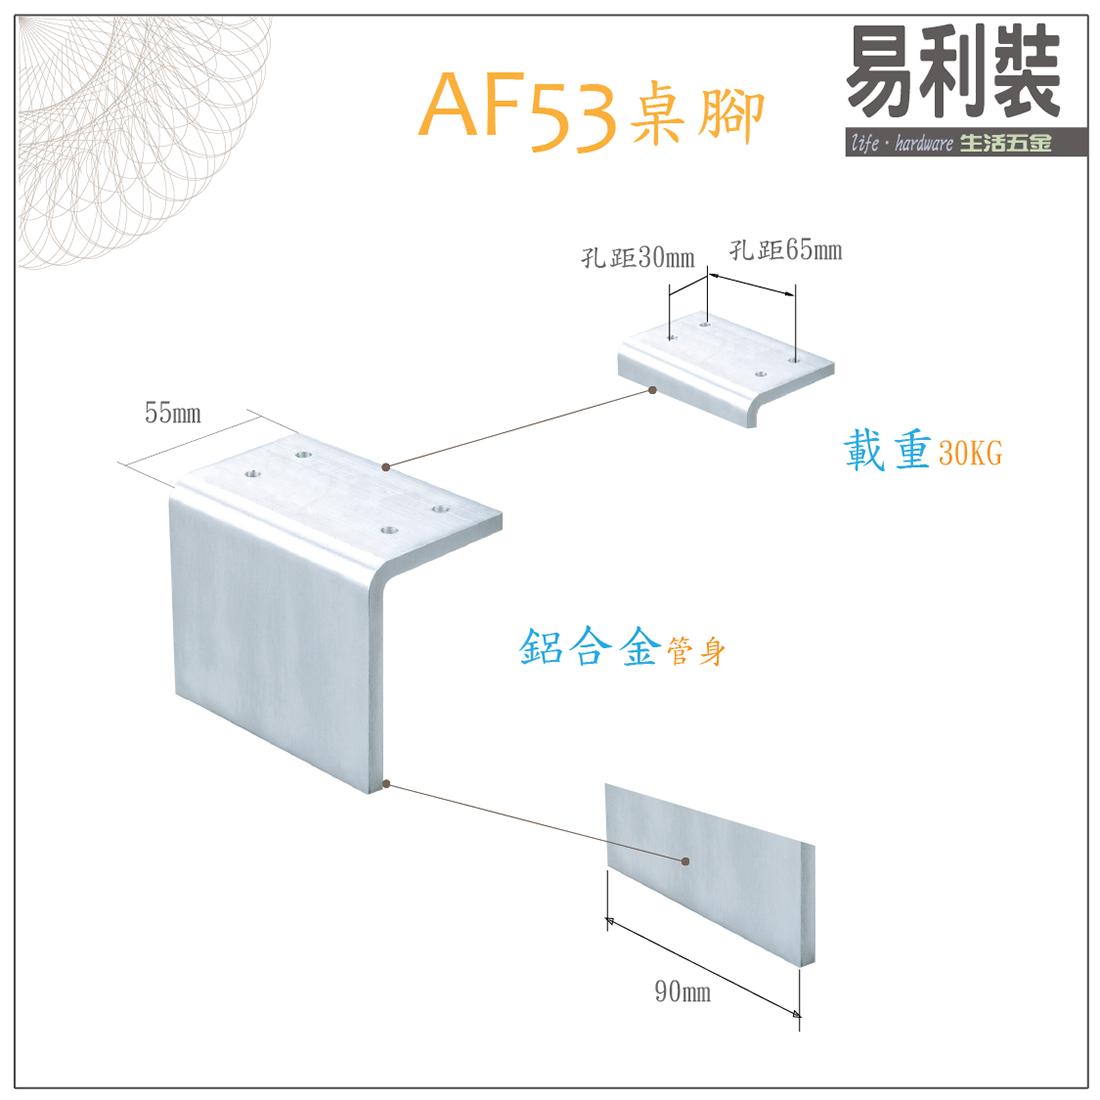 【 EASYCAN  】F53 桌腳 易利裝生活五金 書桌腳 玩具桌腳 工作桌腳 房間 臥房 衣櫃 小資族 辦公家具 系統家具 1